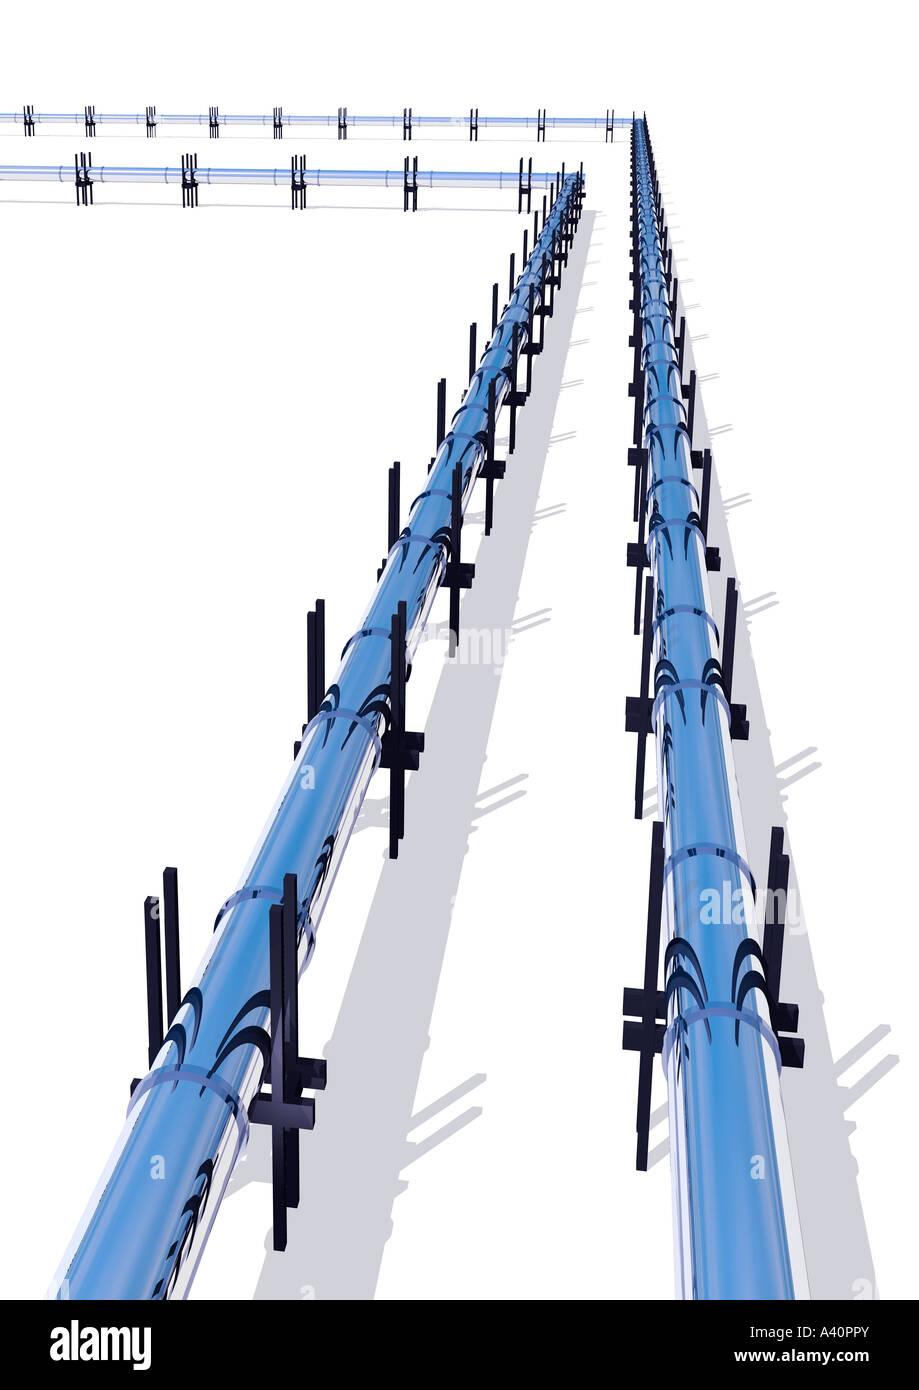 Rohrleitungen Stockbild